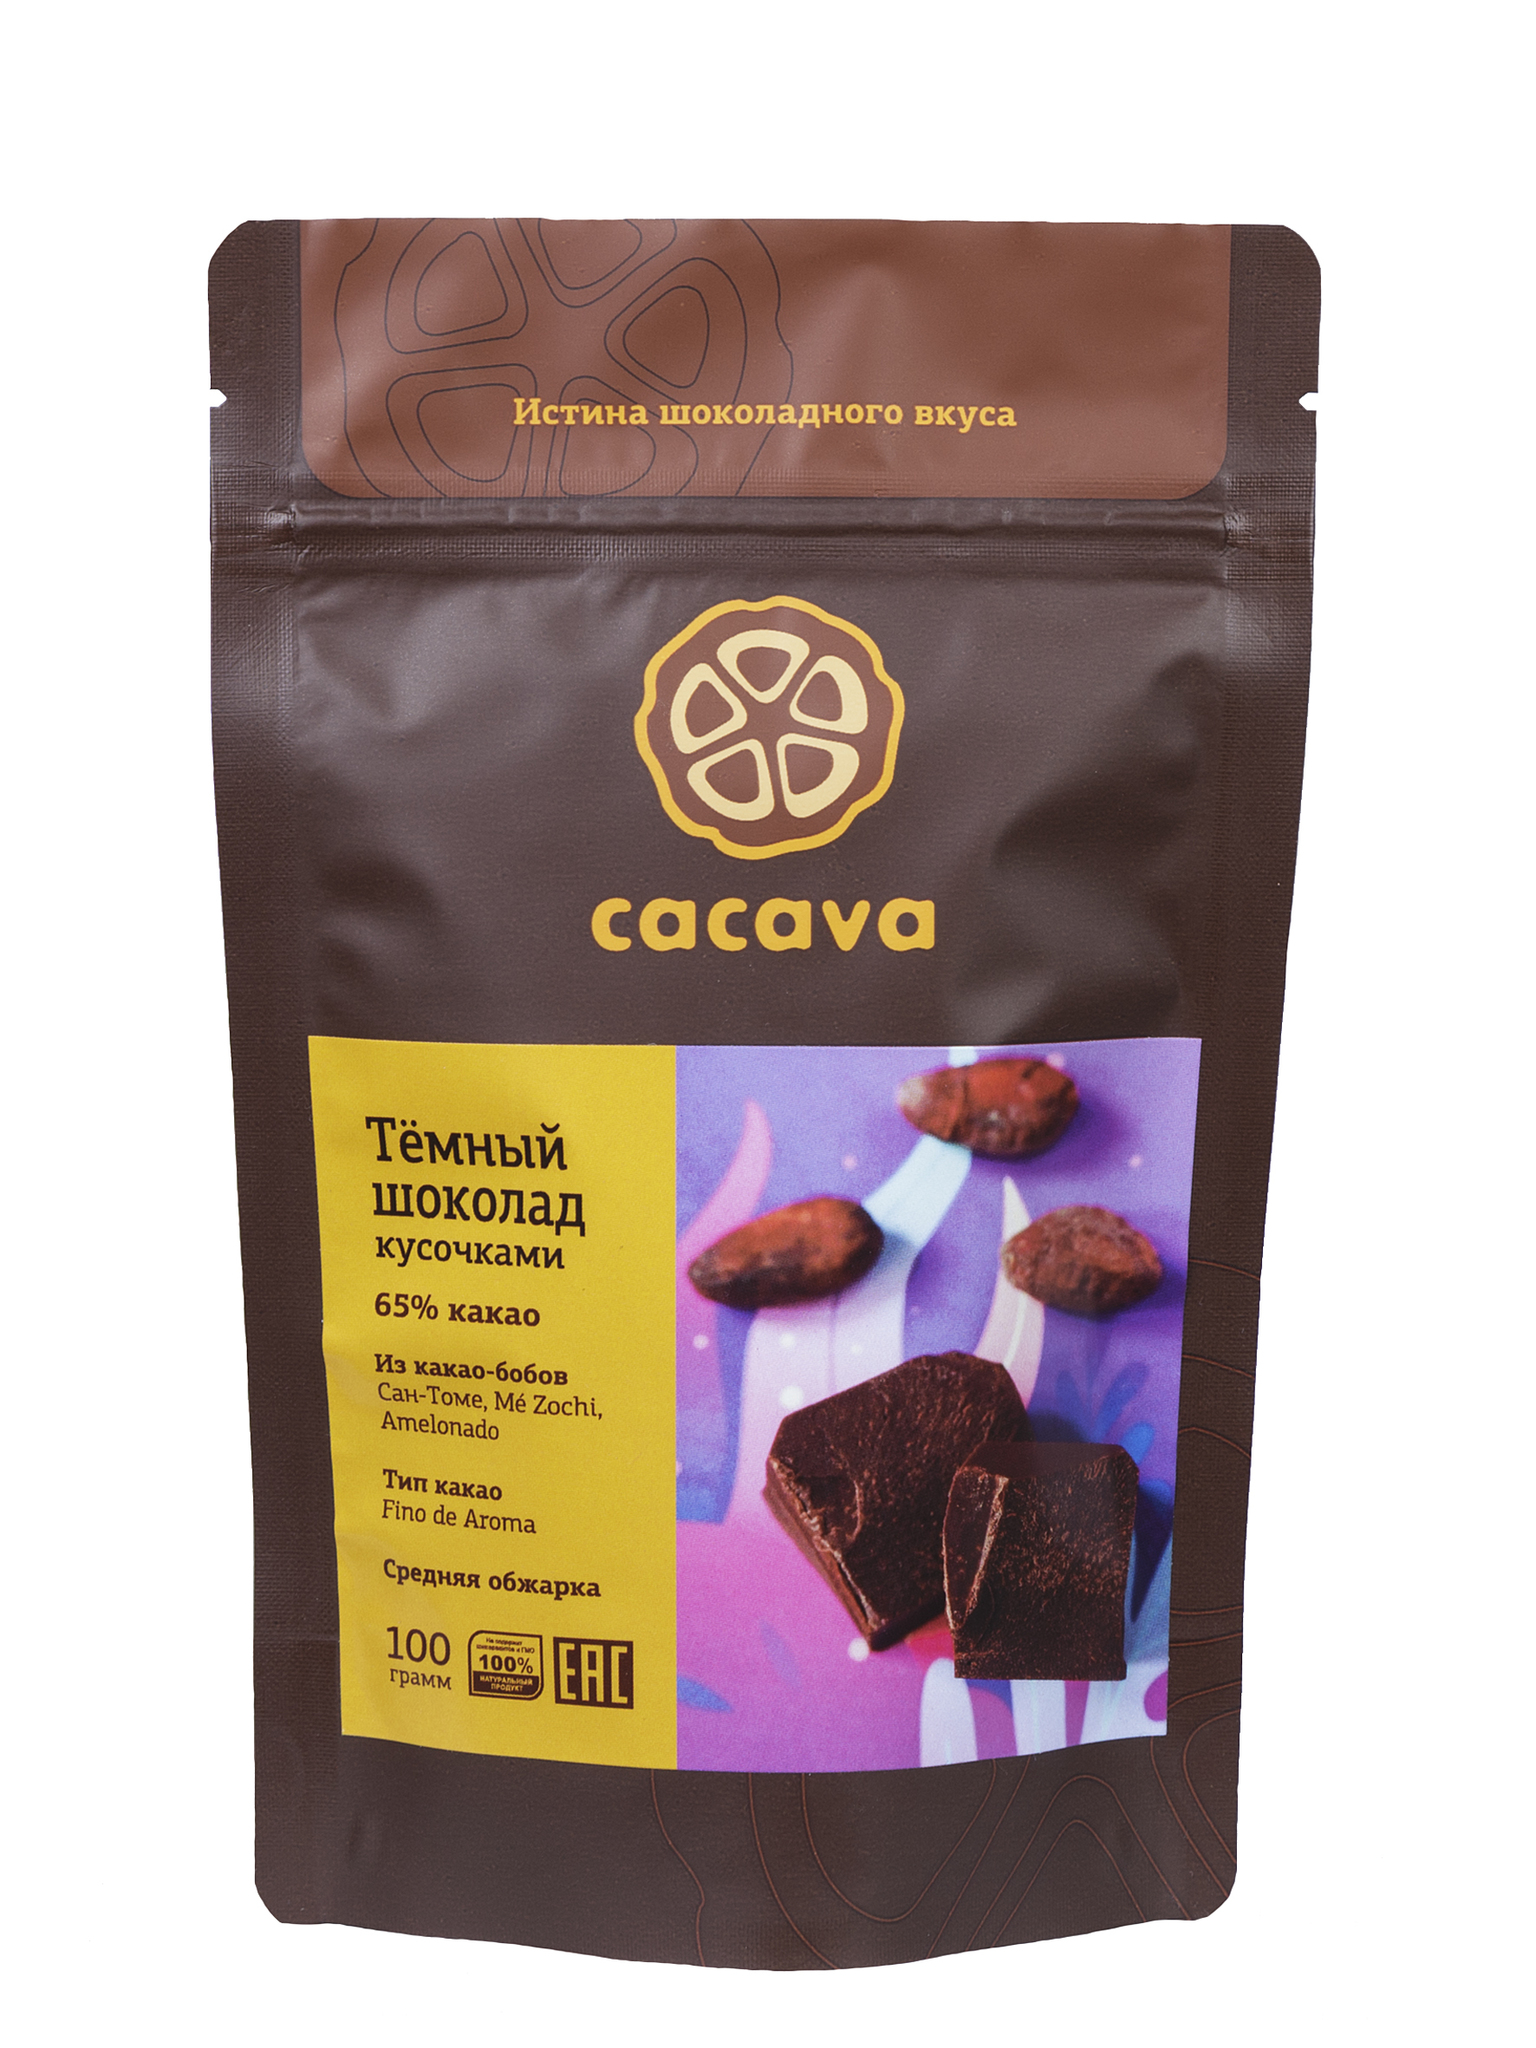 Тёмный шоколад 65 % какао (Сан-Томе), упаковка 100 грамм